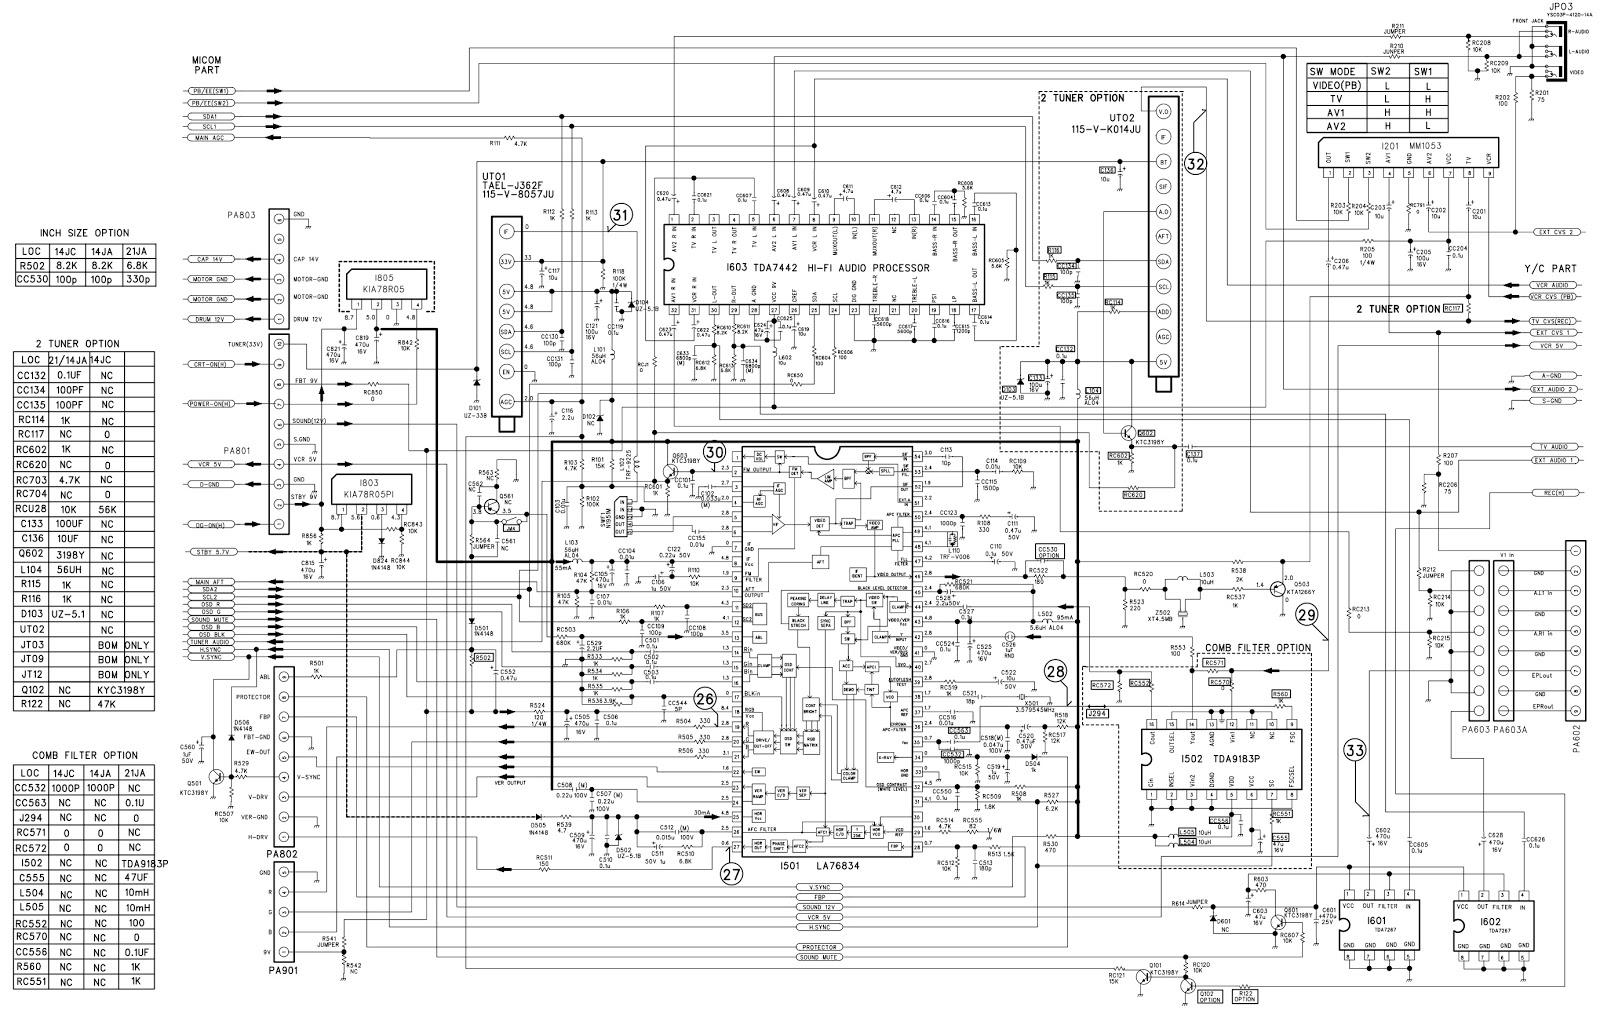 edis 4 wiring diagram 2016 ford f 150 7 pin trailer 8 imageresizertool com